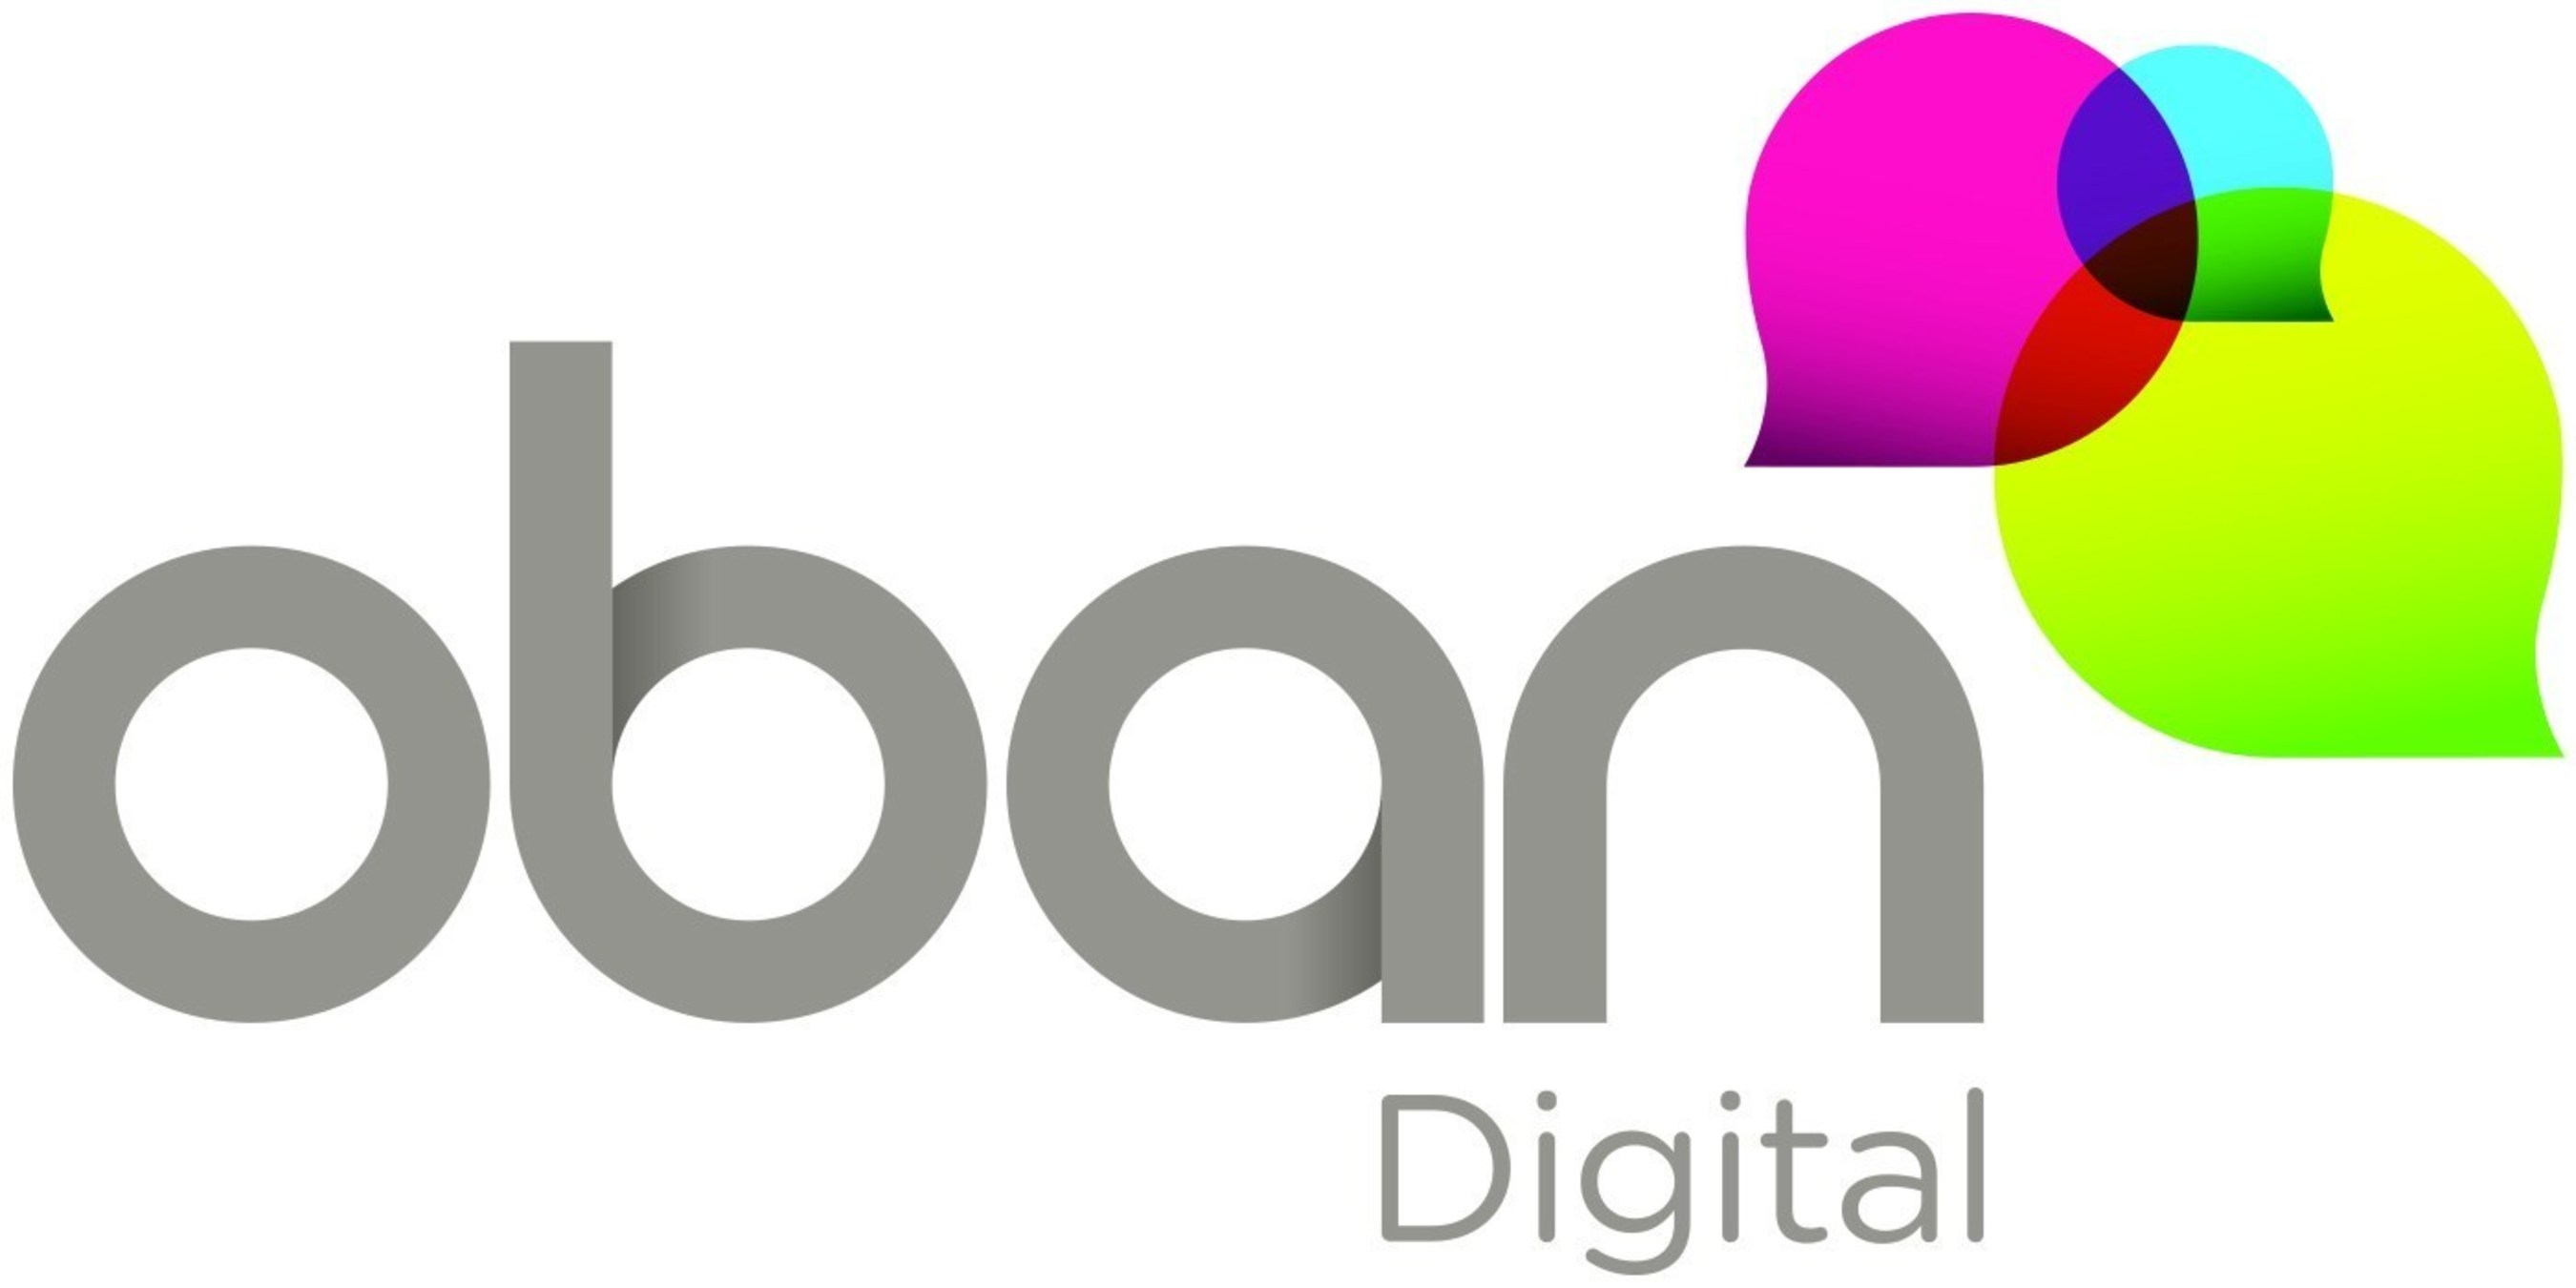 Oban Digital